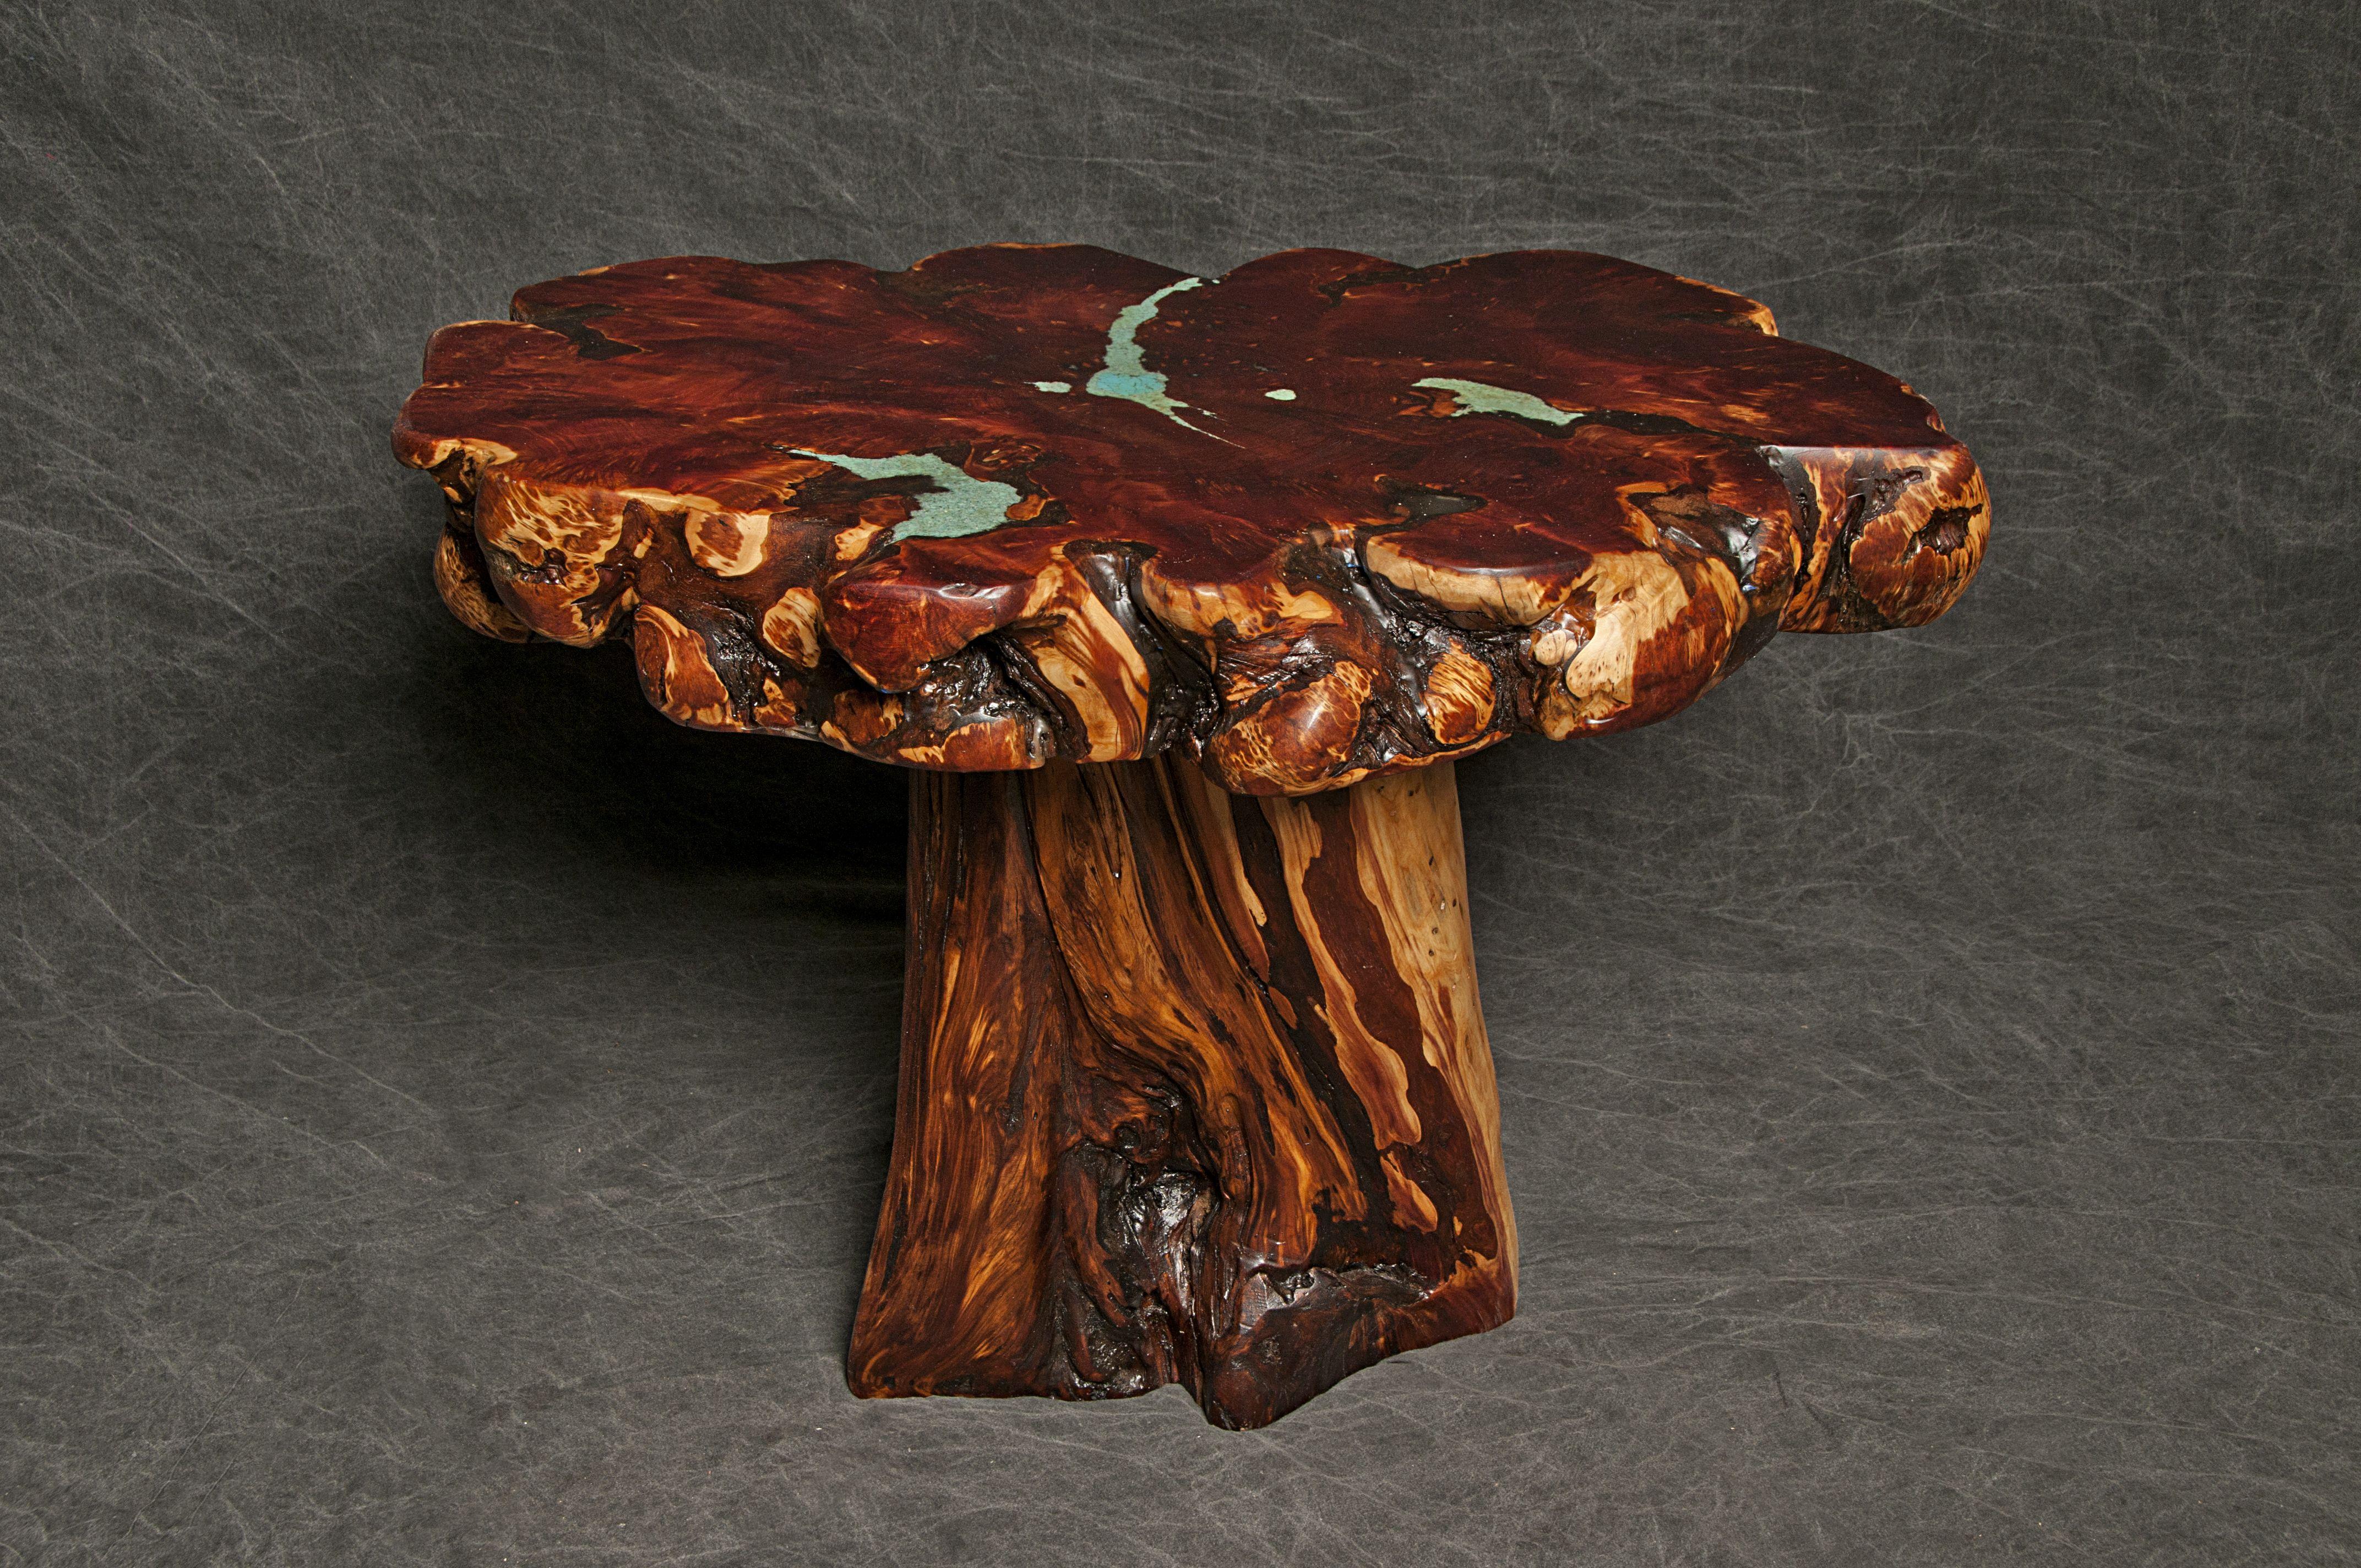 Buy A Custom Cedar Burl End Table With Turquoise Inlay